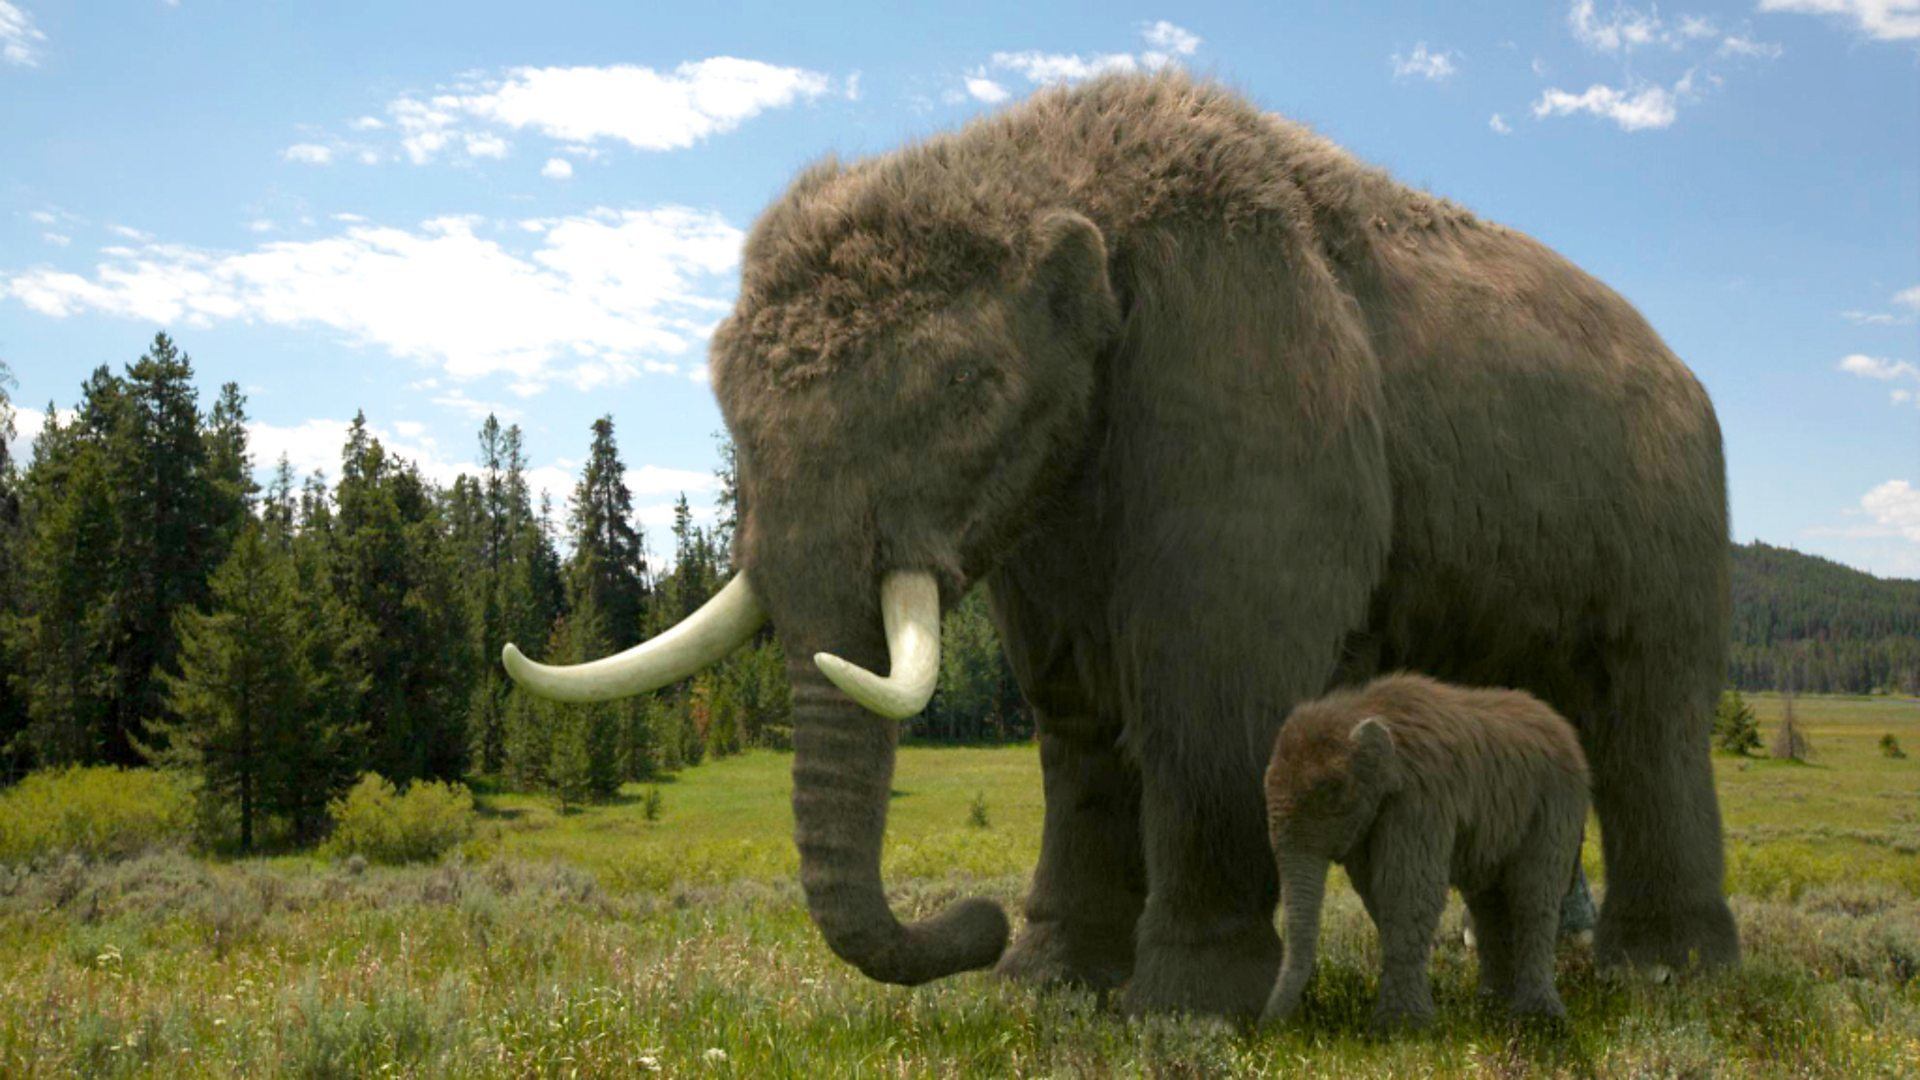 giant animals north america - HD1920×1080